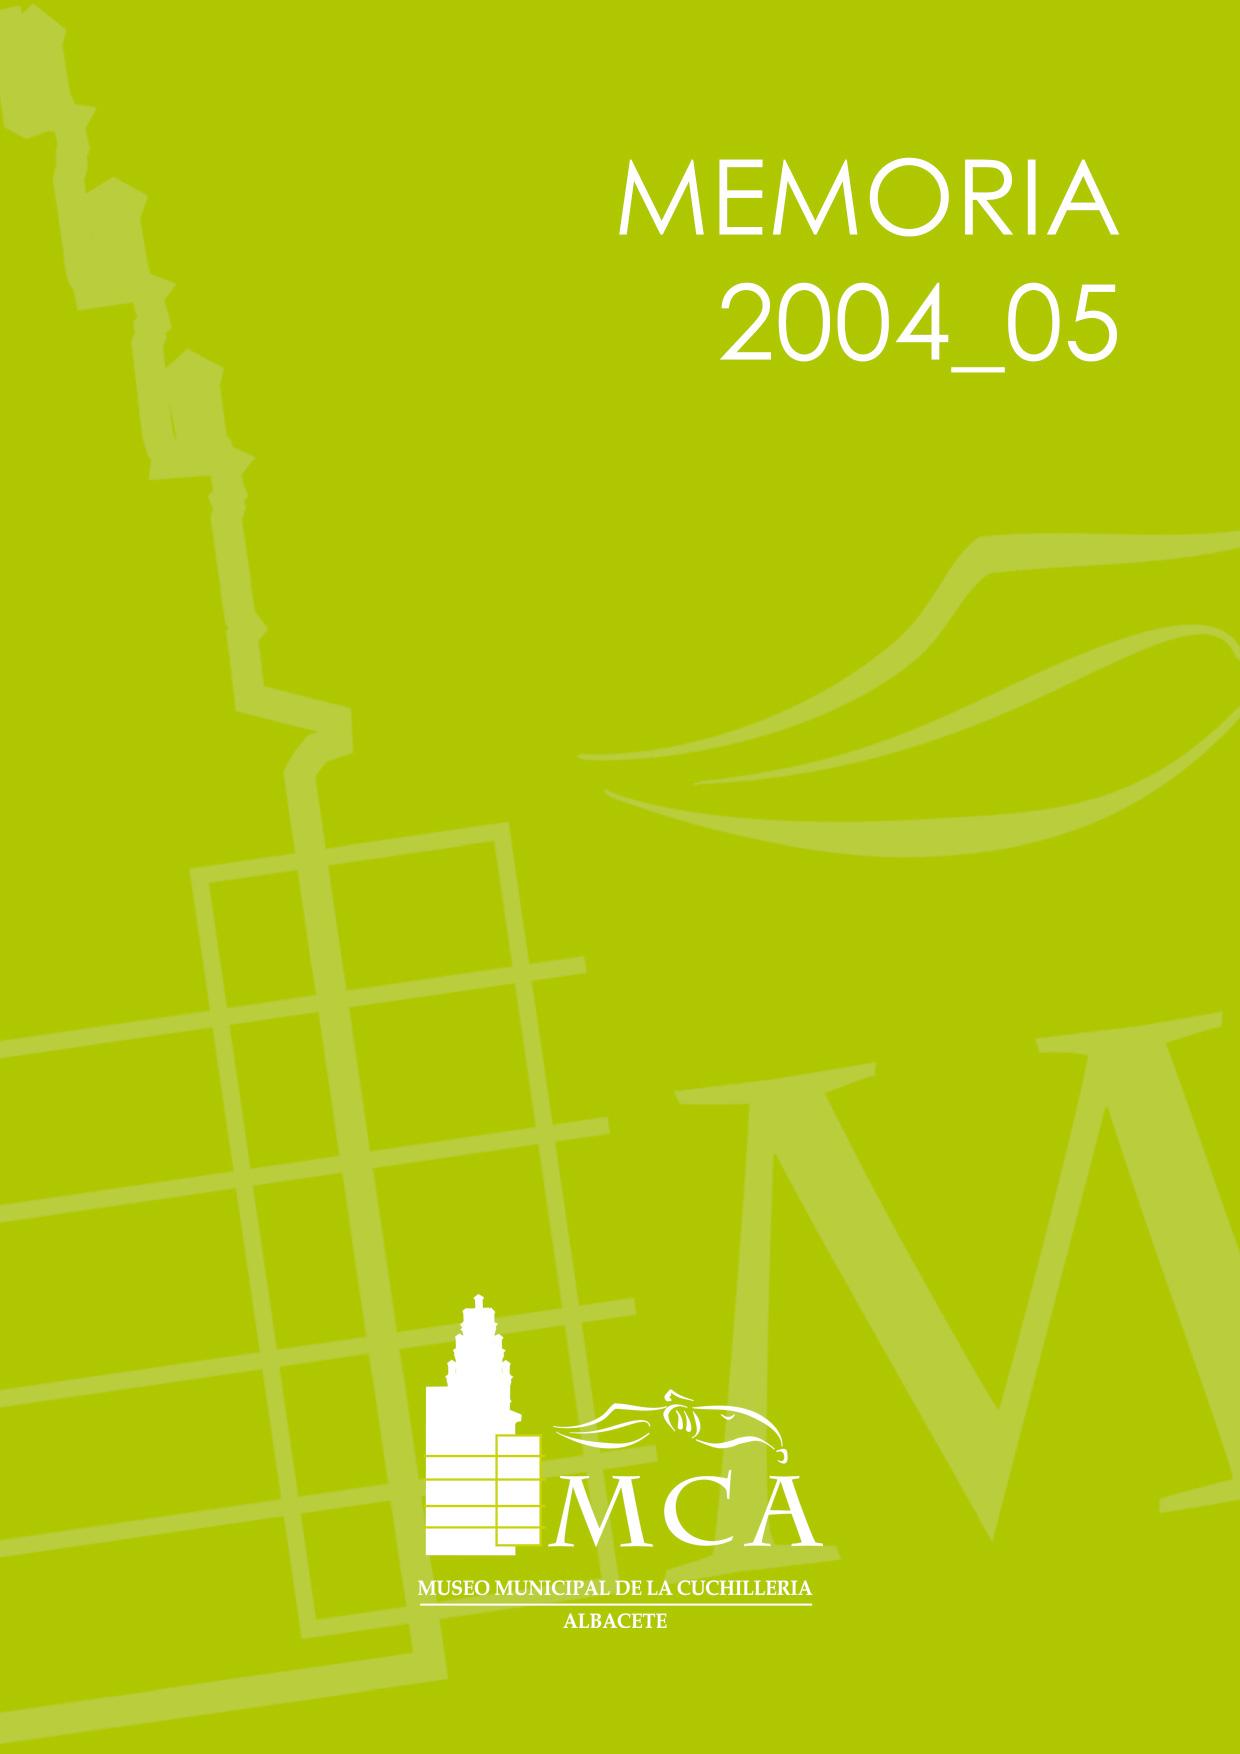 Annual Report 2004/05